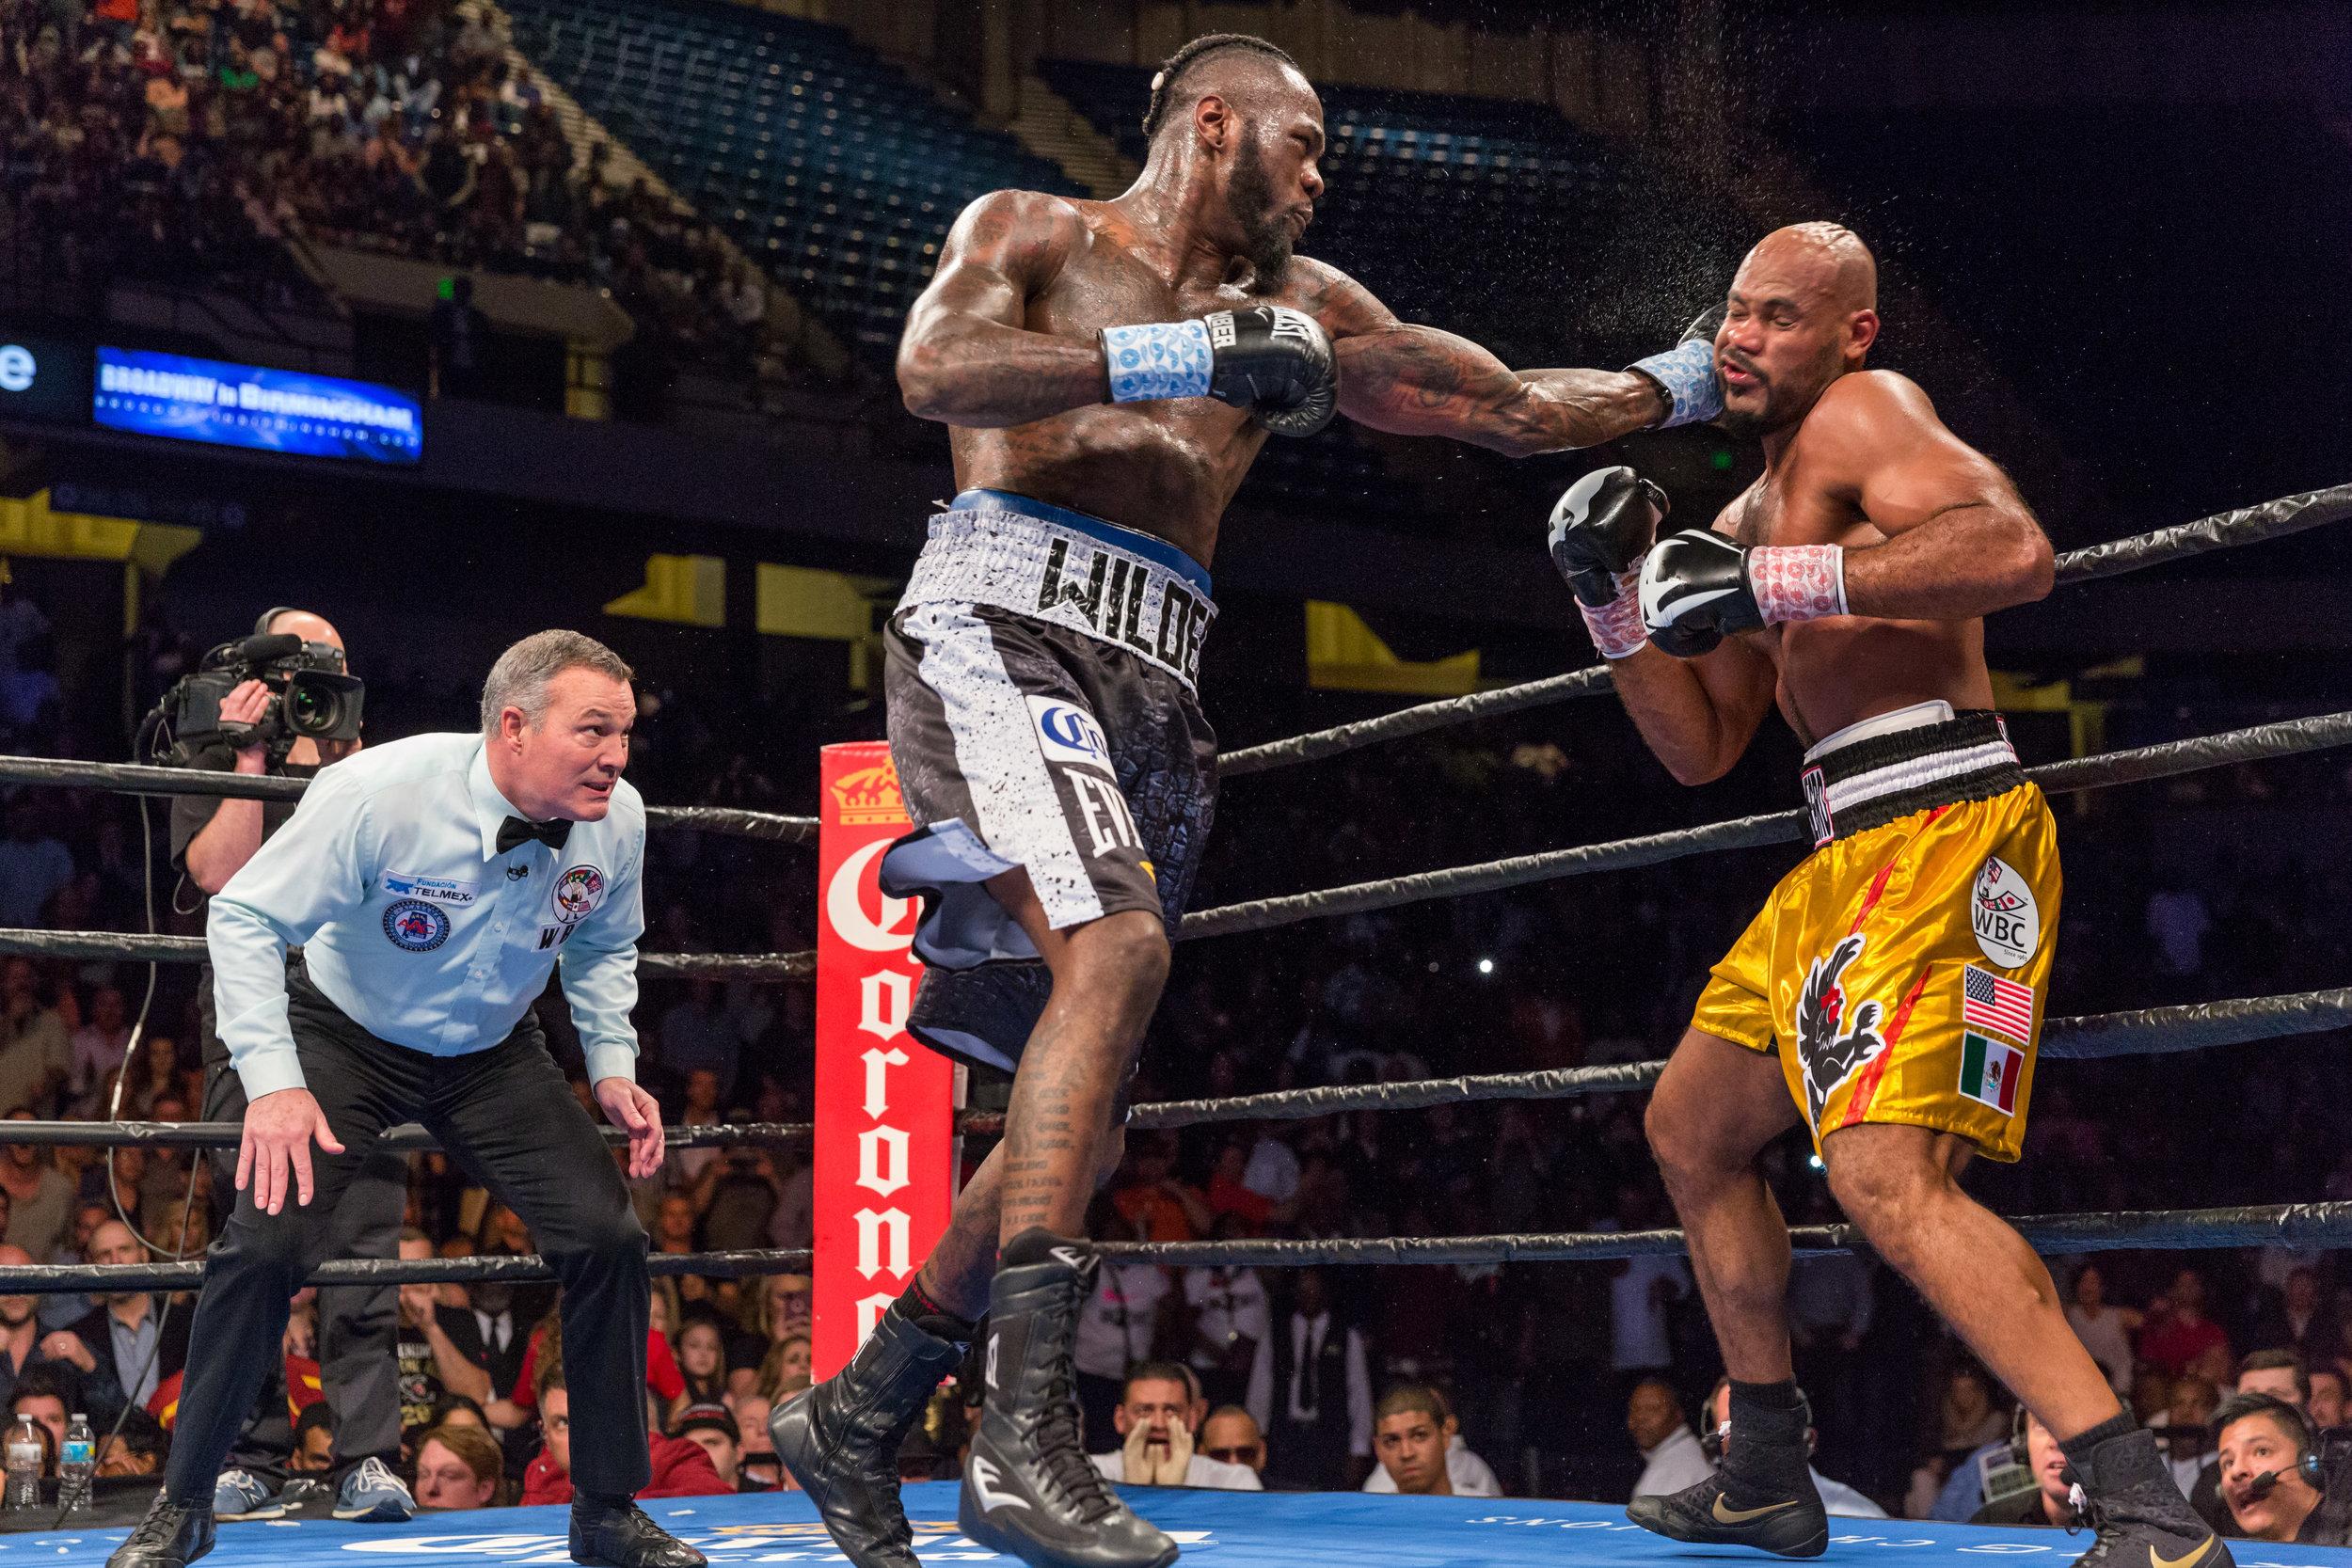 Deontay Wilder vs Gerald Washington - February 25_ 2017_02_25_2017_Fight_Ryan Hafey _ Premier Boxing Champions13.jpg